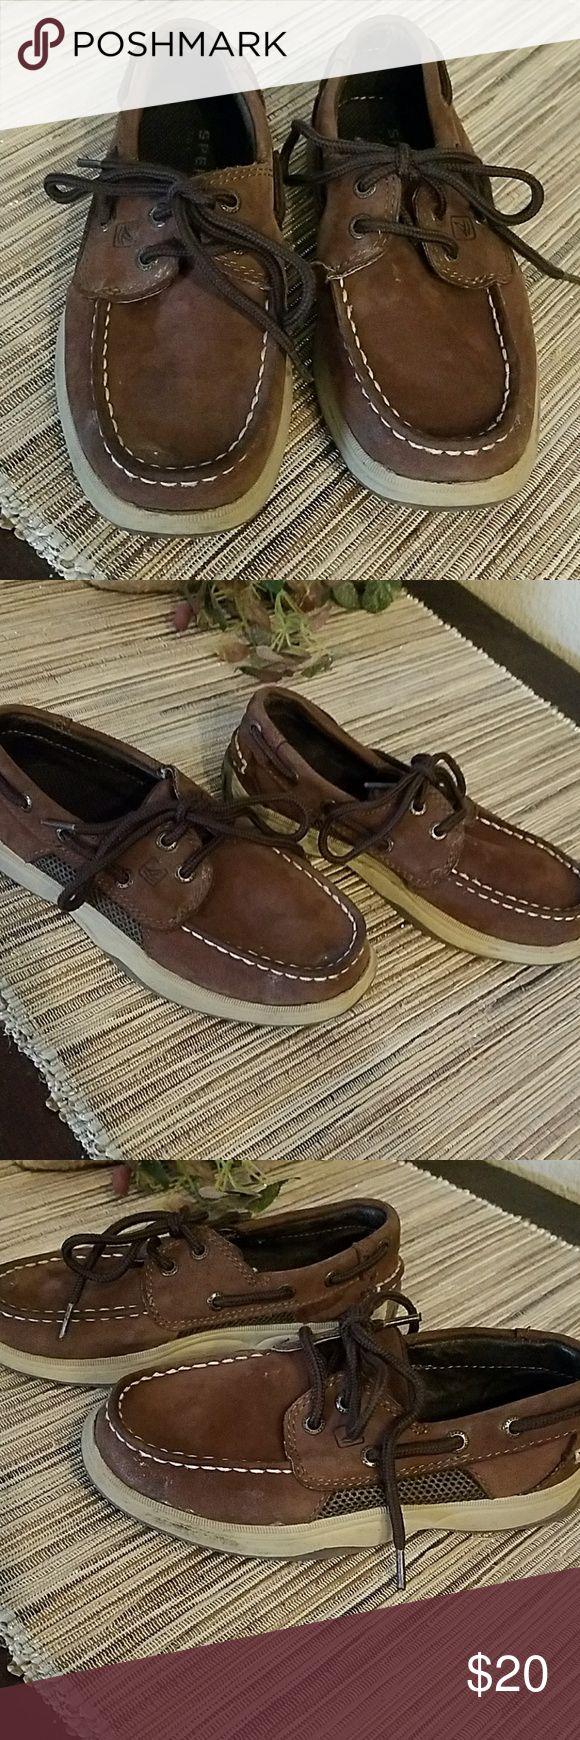 Boys Sperry Top Sider leather Intrepid Boys Sperry Top Sider Leather Intrepid deck shoes Sperry Top-Sider Shoes Water Shoes